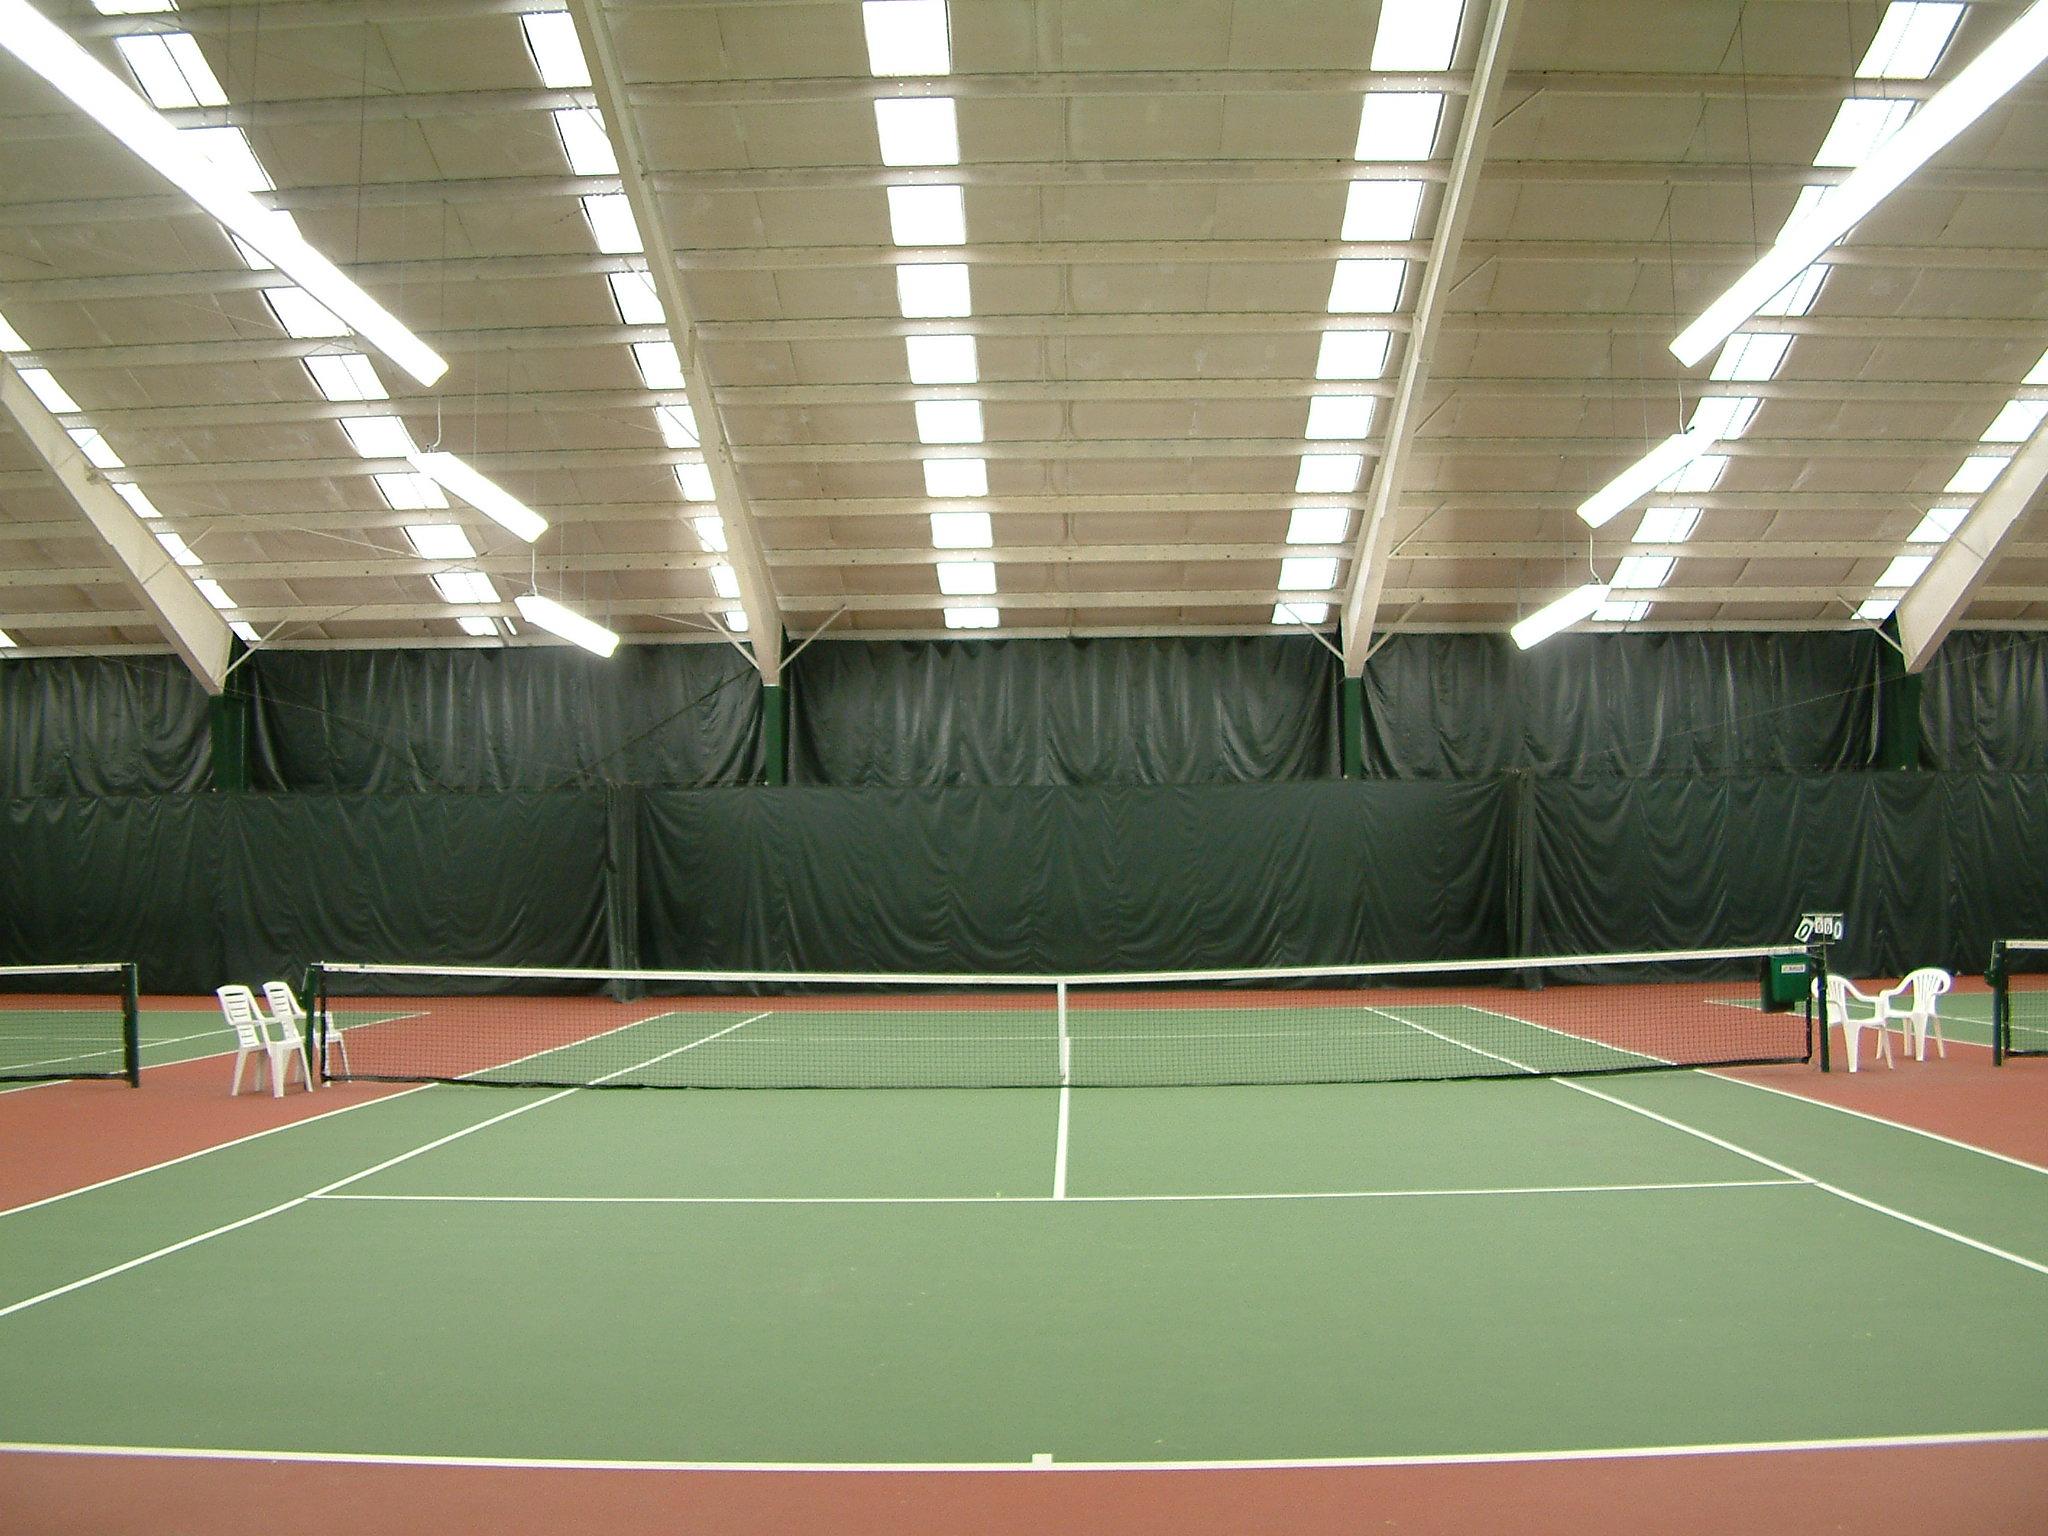 Case Study Boeing Employee Tennis Club